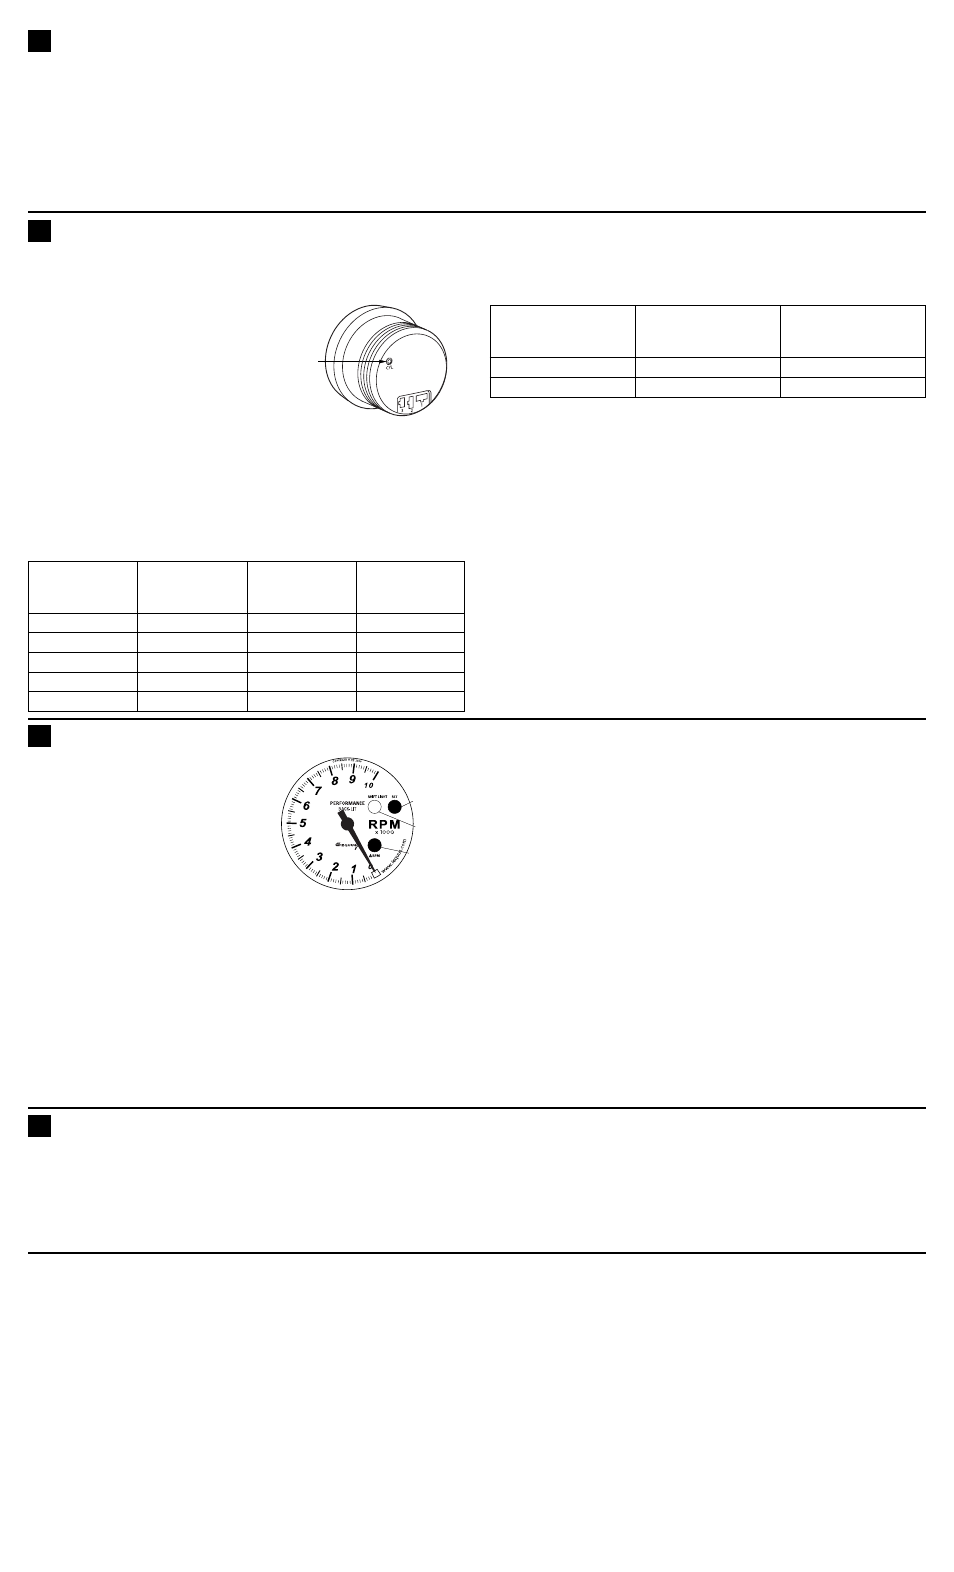 holley commander 950 wiring diagram aem wiring diagram